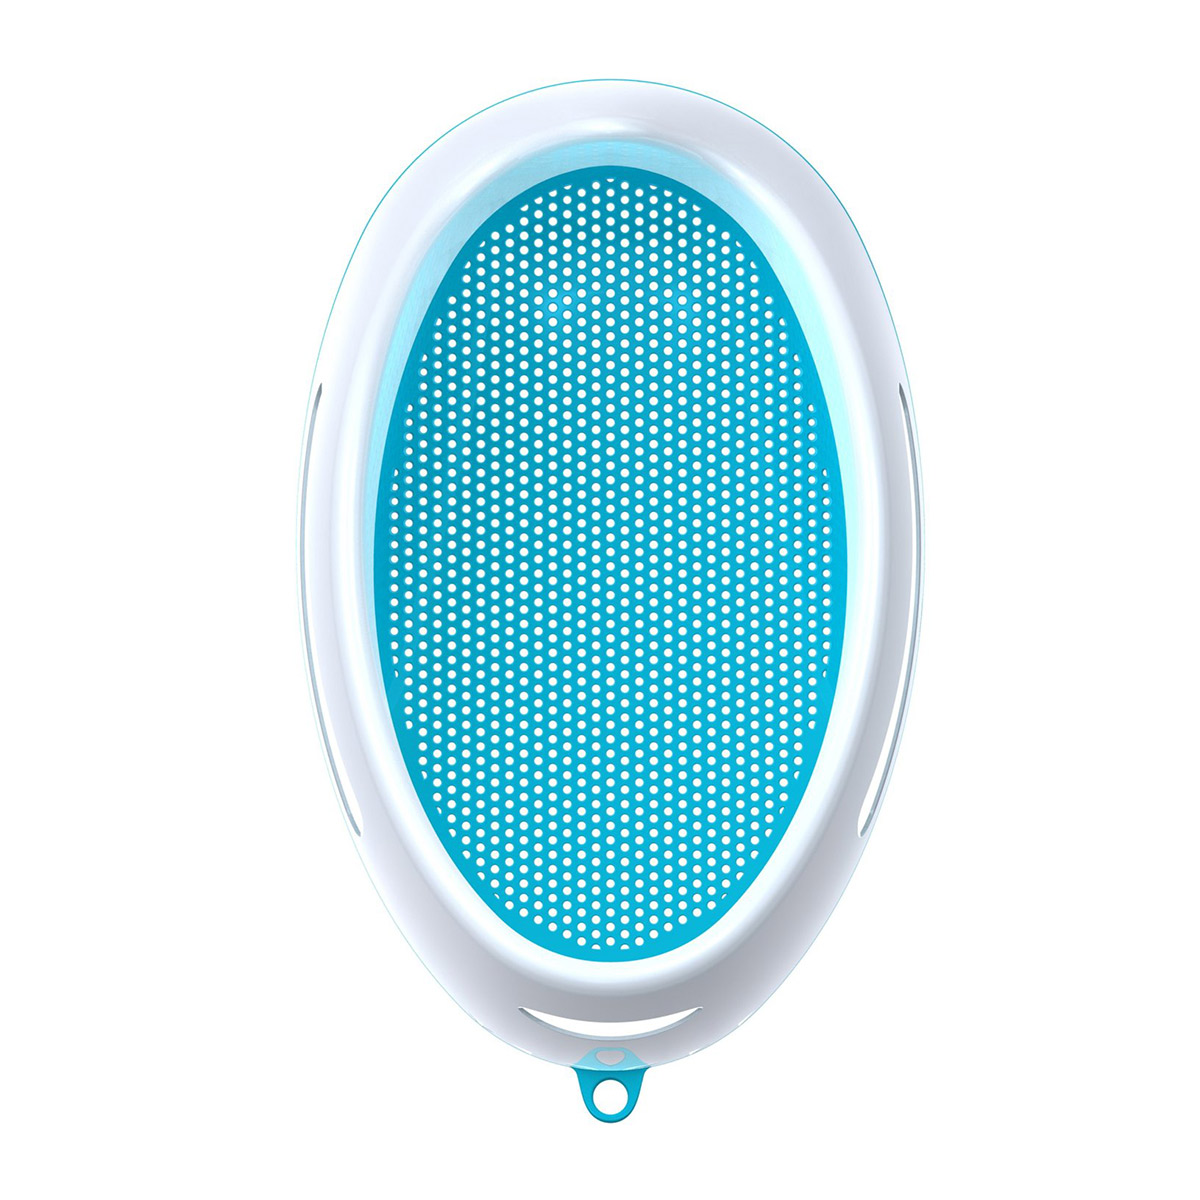 transat de bain bleu blanc 400400 achat vente anneau transat sur larmoiredebebe